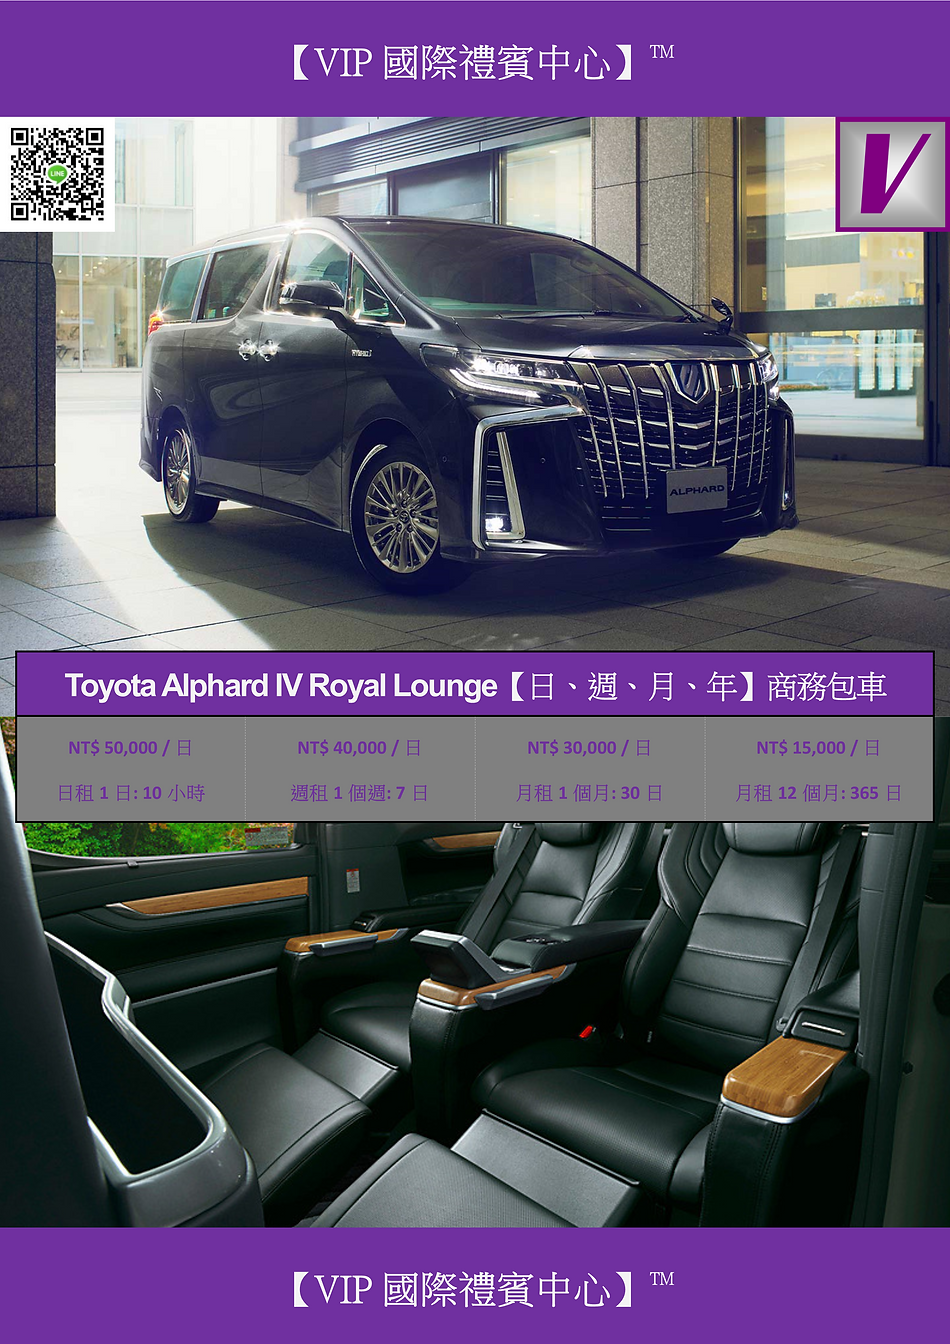 VIP國際禮賓中心 TOYOTA ALPHARD IV ROYAL LOUNGE 中國臺灣接送包車